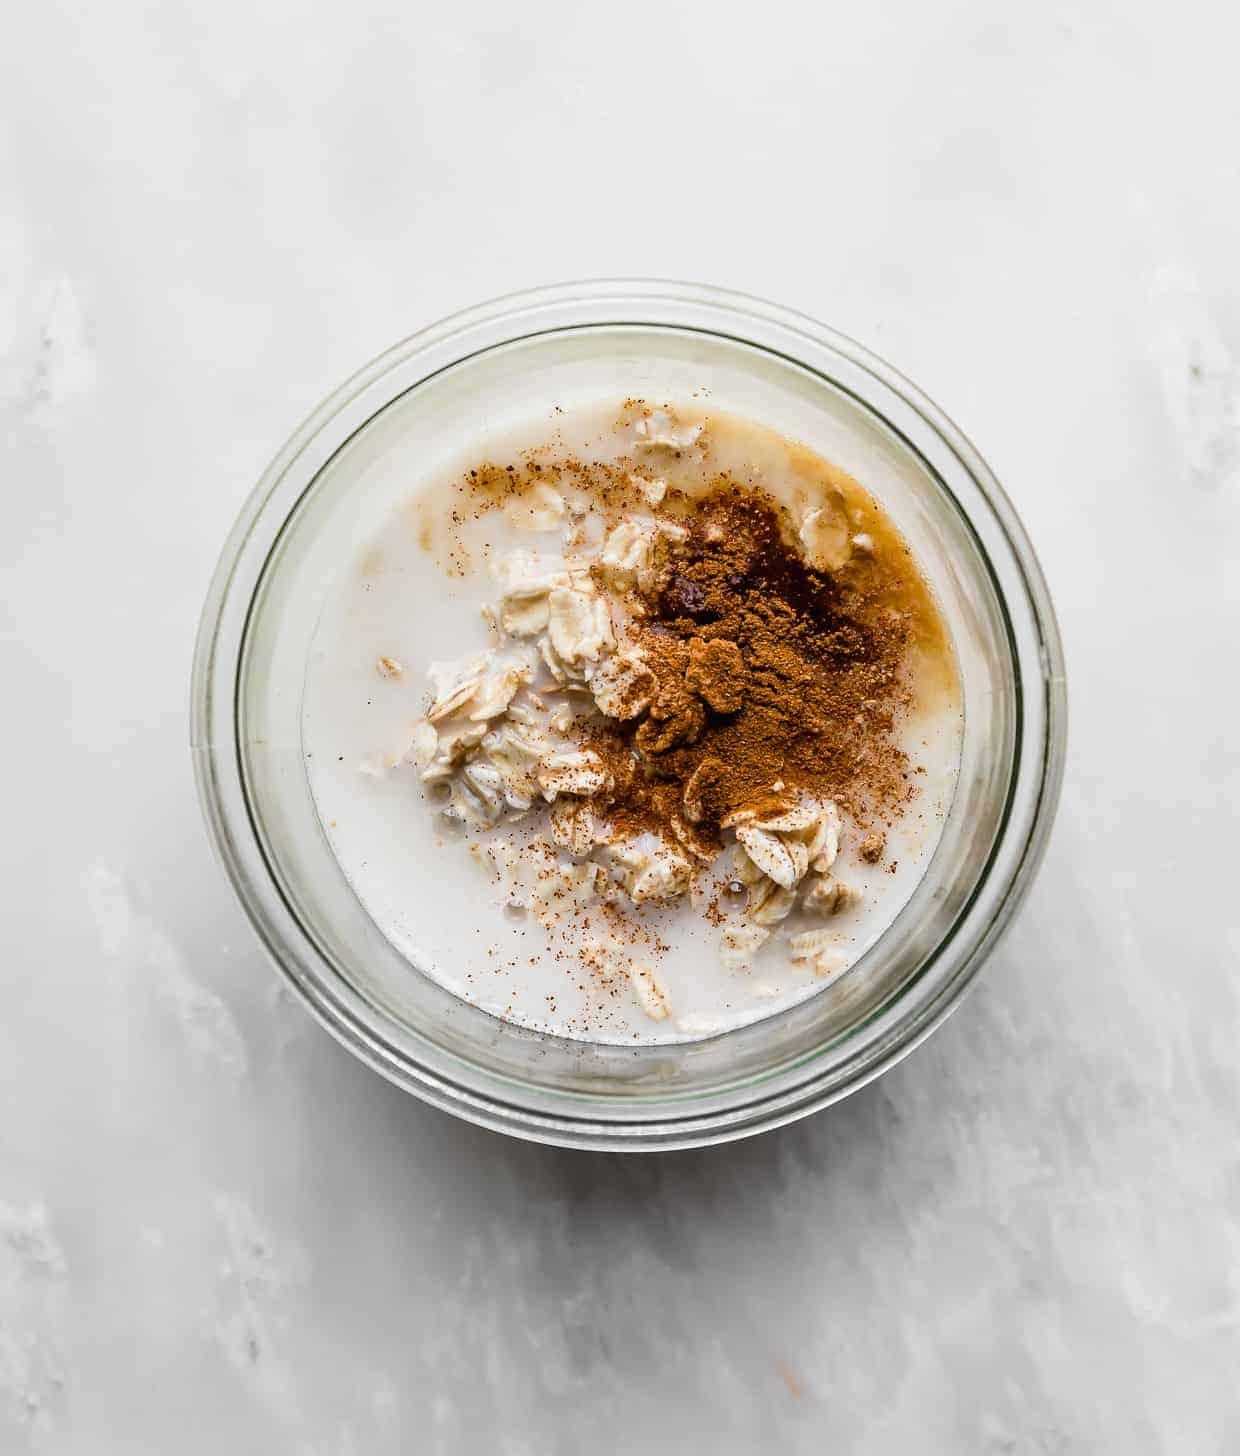 A glass jar full of rolled oats, milk, cinnamon, and nutmeg.